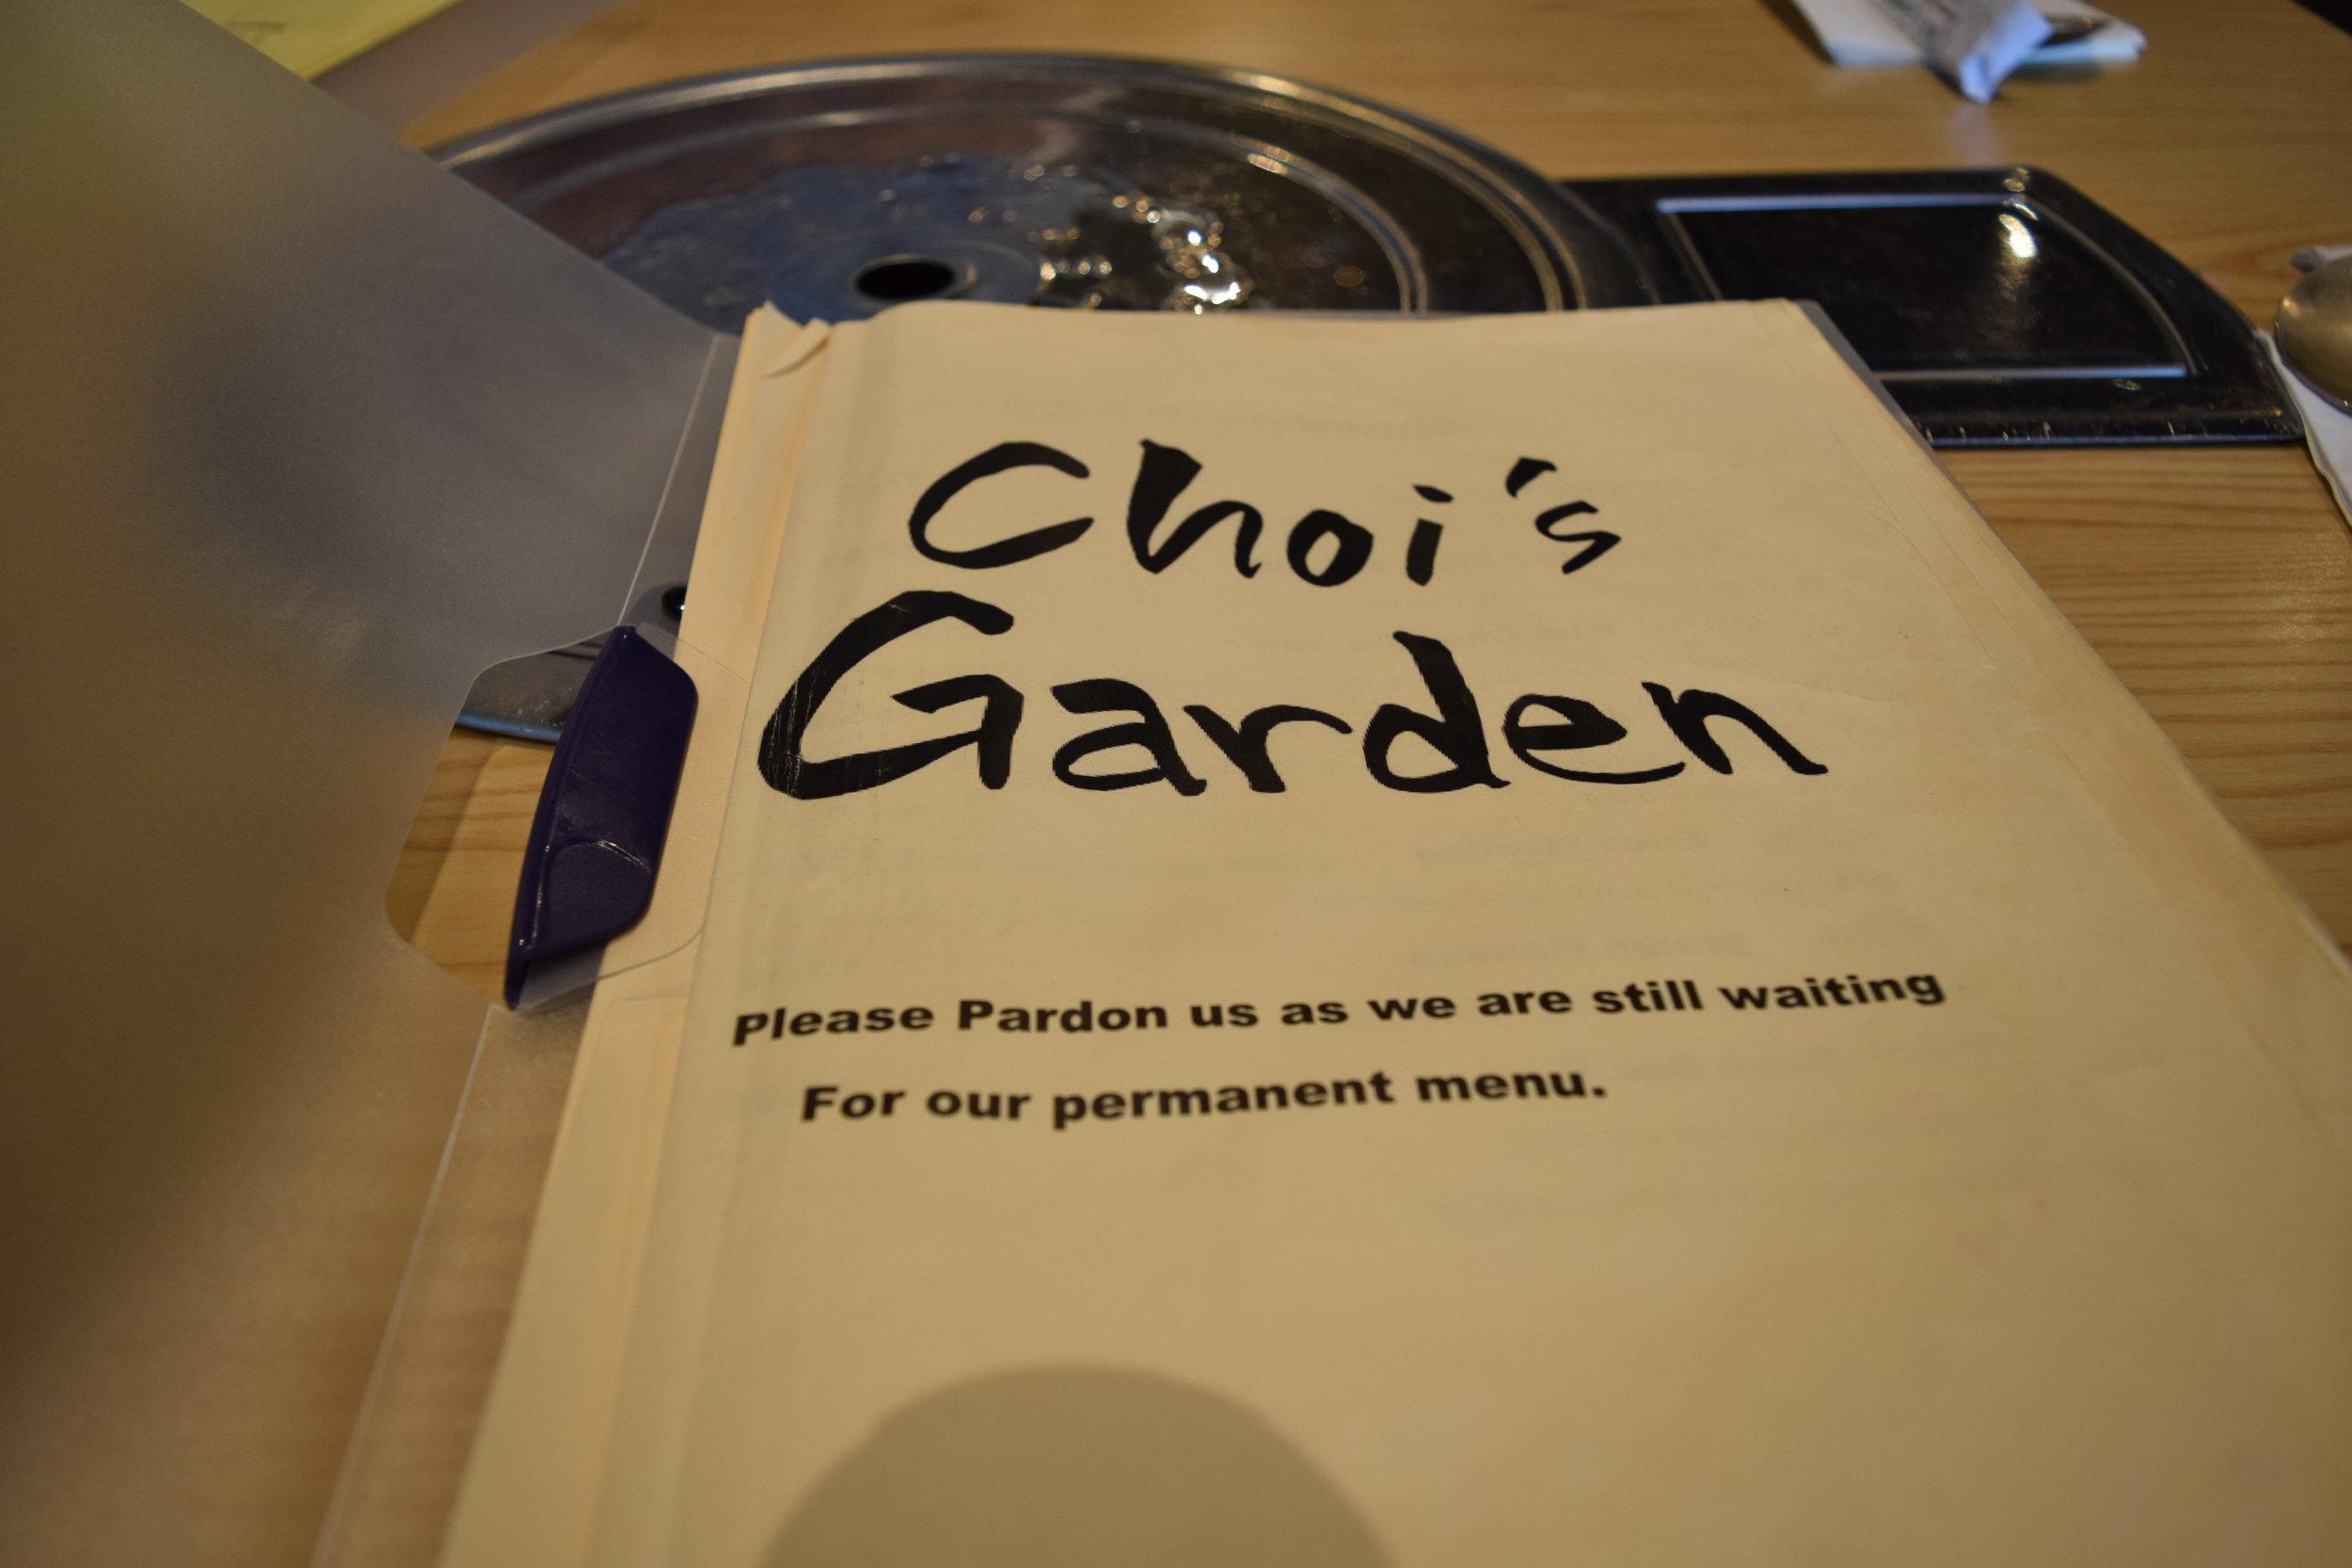 ono hawaiian choi's garden korean bbq